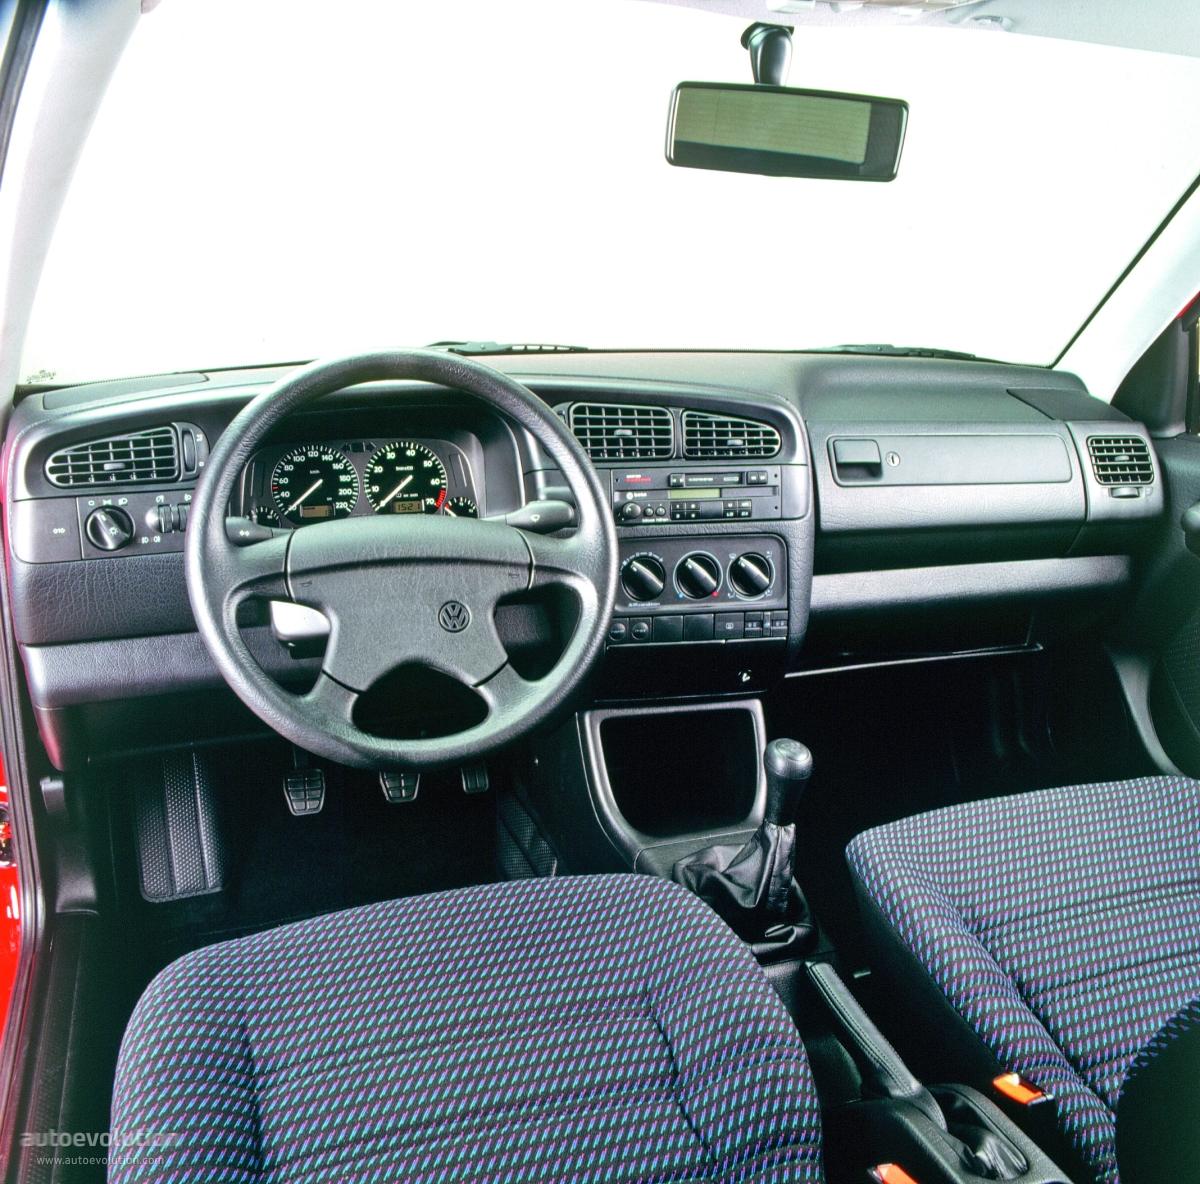 Volkswagen Vento Jetta Specs Photos 1992 1993 1994 1995 1996 Wiring Diagram 1998